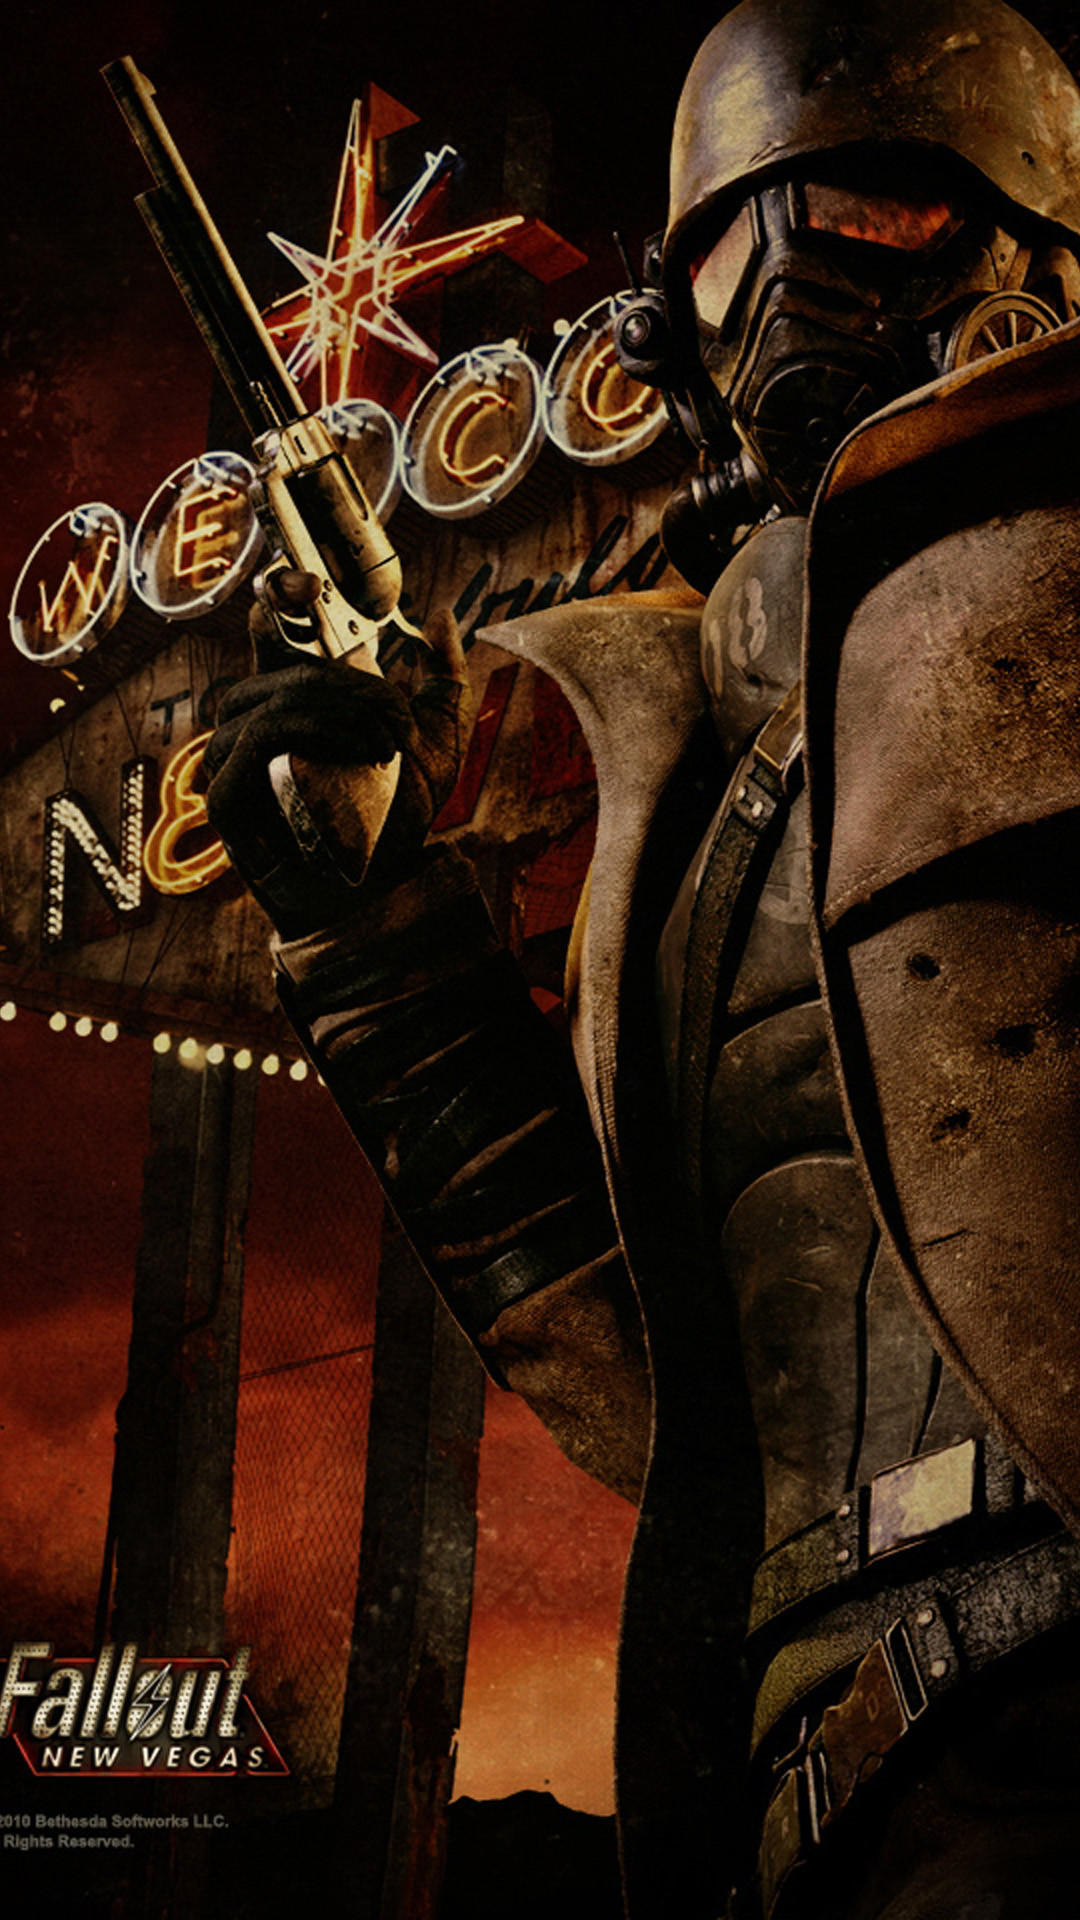 iPhone 6 plus Fallout new vegas Games wallpaper